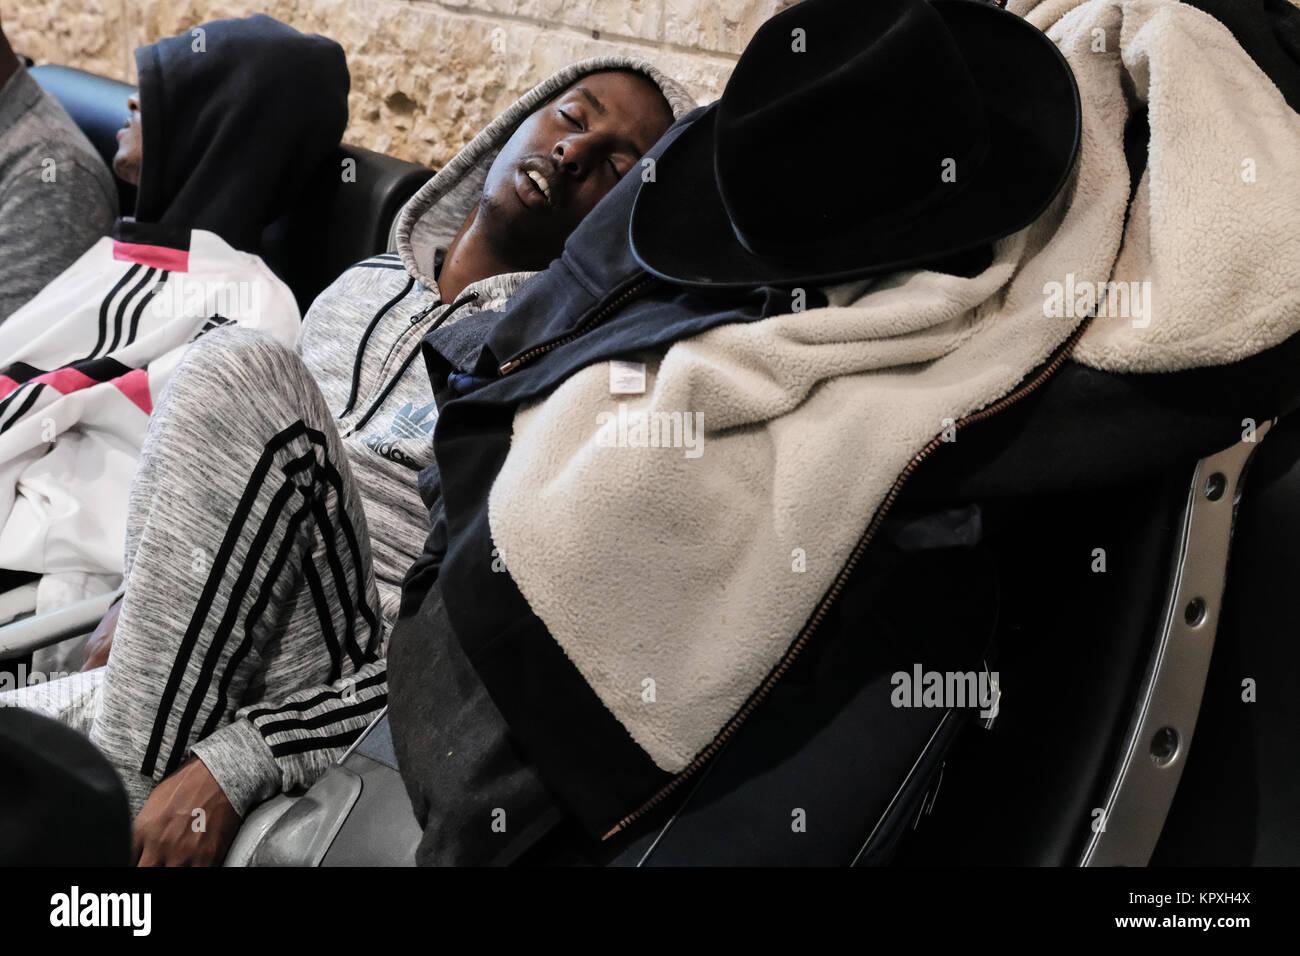 Jerusalén, Israel. 17 de diciembre de 2017. Mostradores de ...